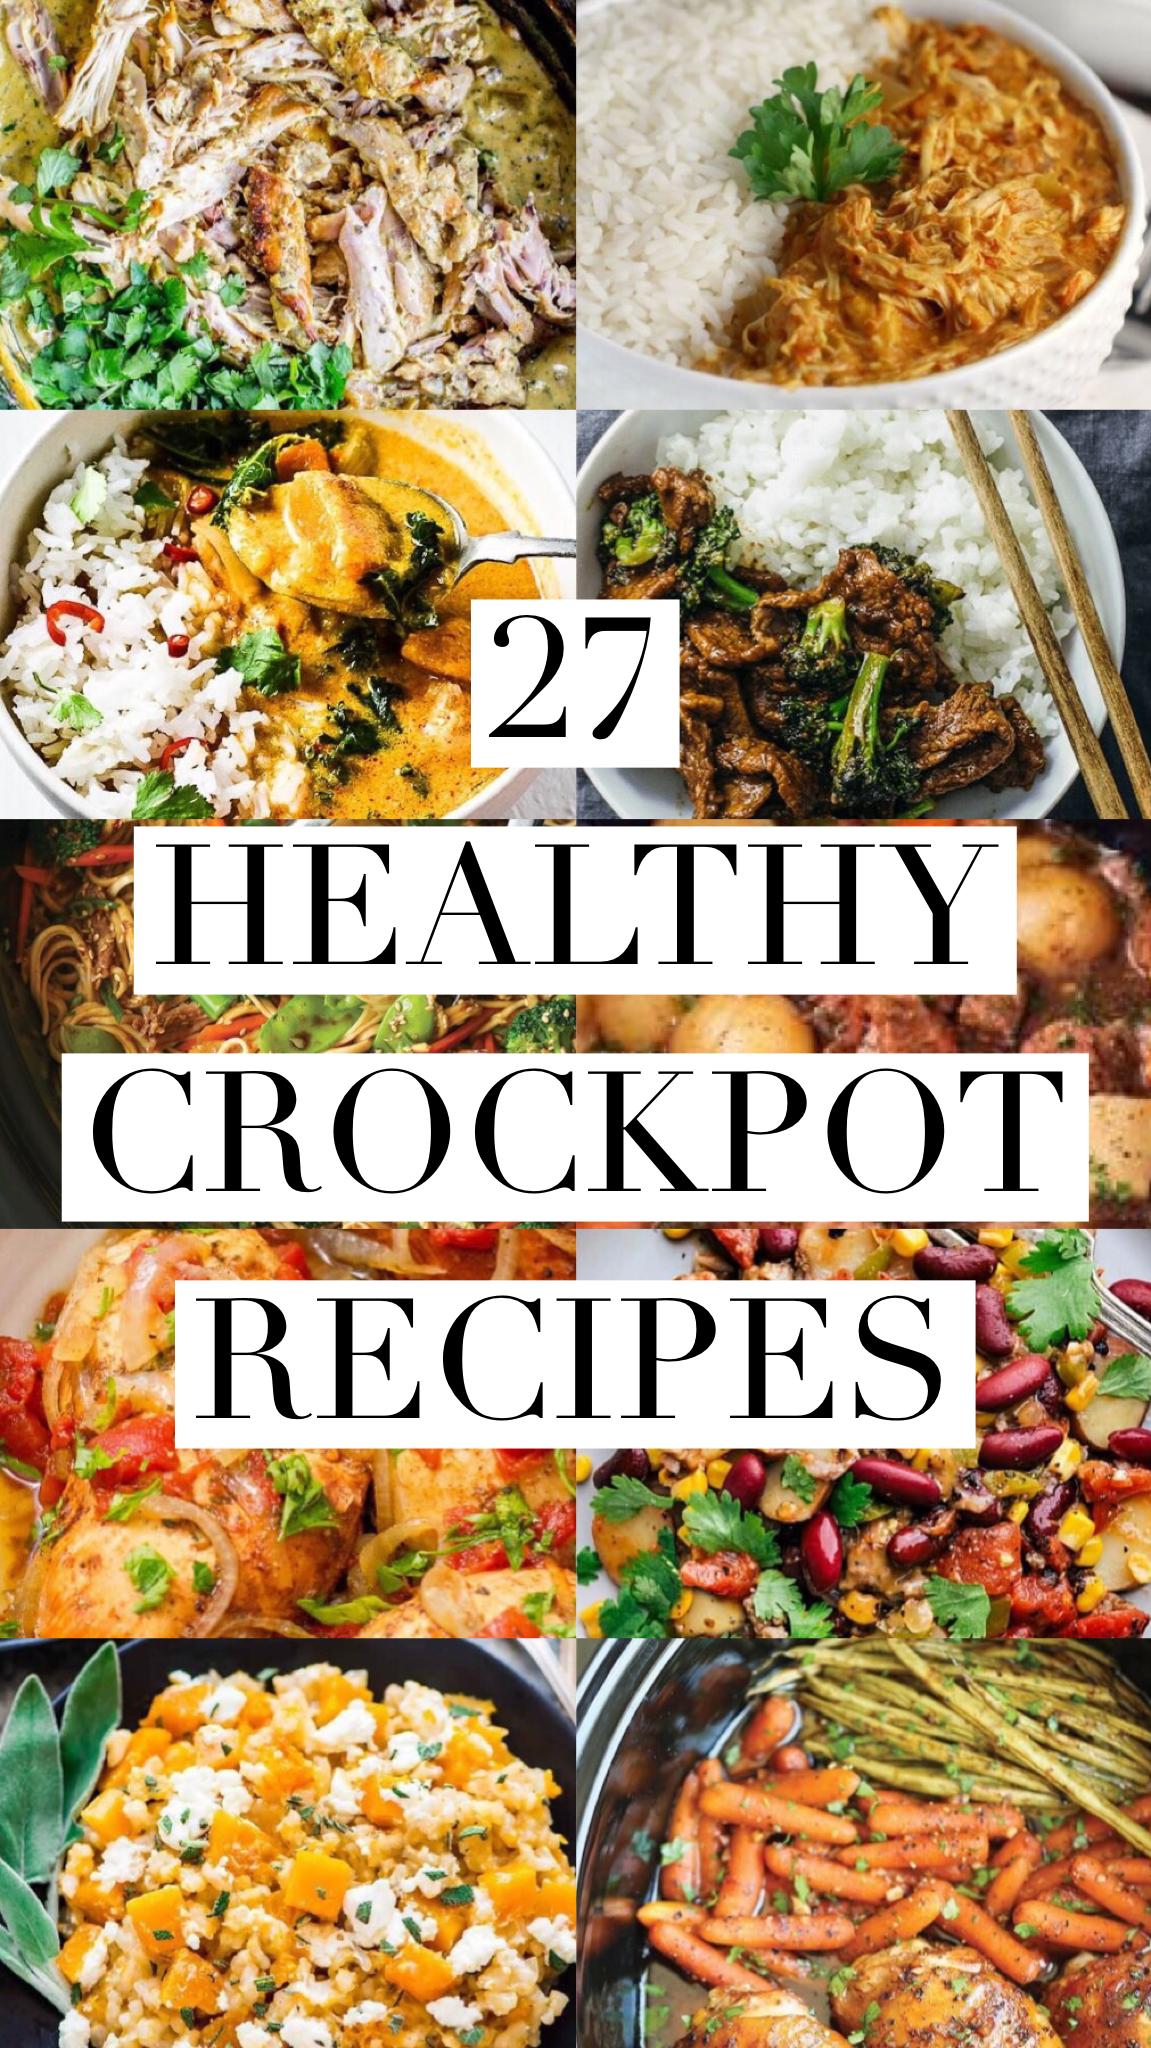 27 Healthy Crockpot Recipes images